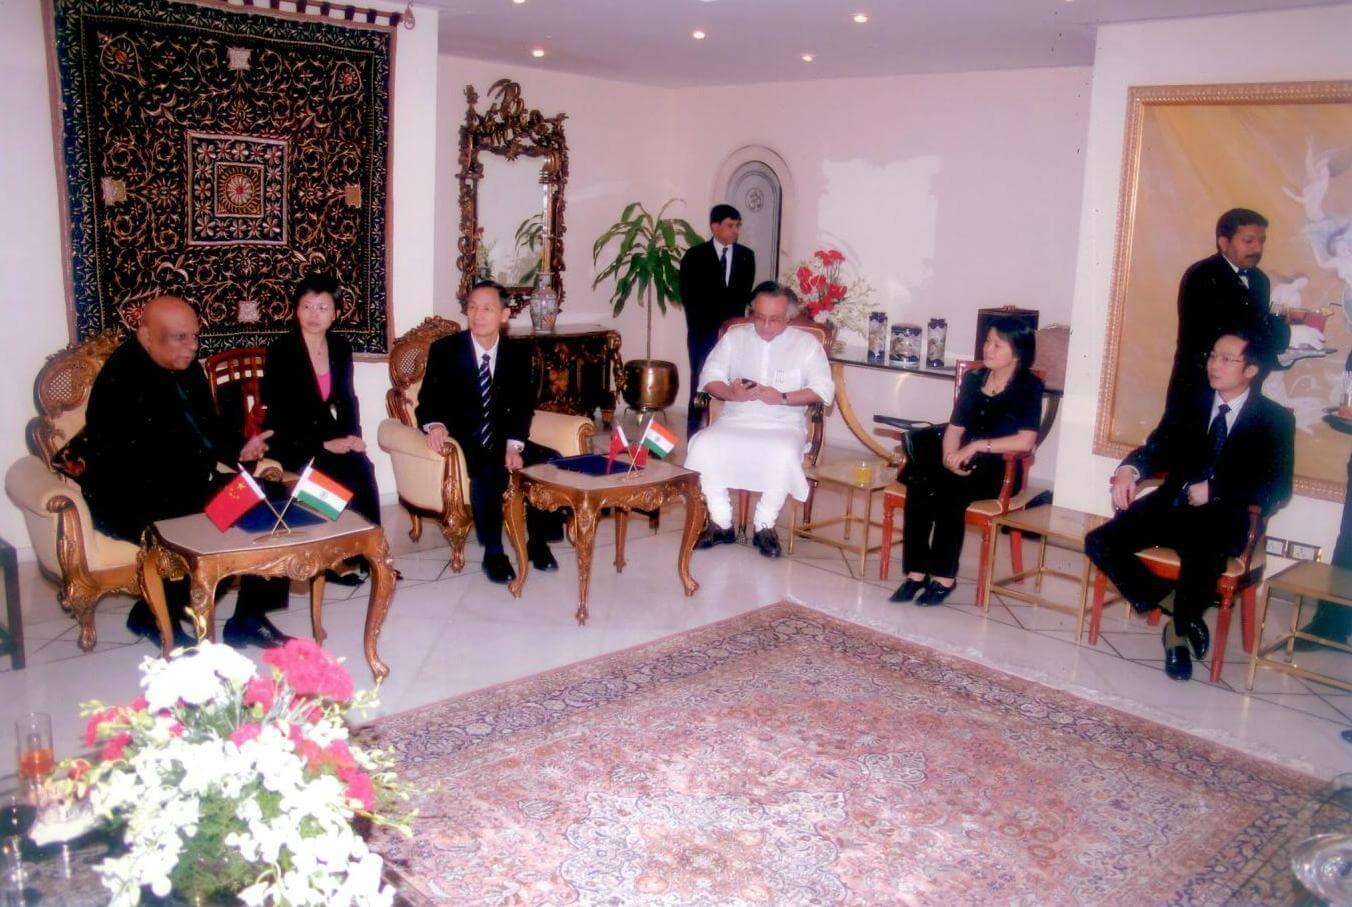 Dr. M with Jairam Ramesh Former Member of Parliament India